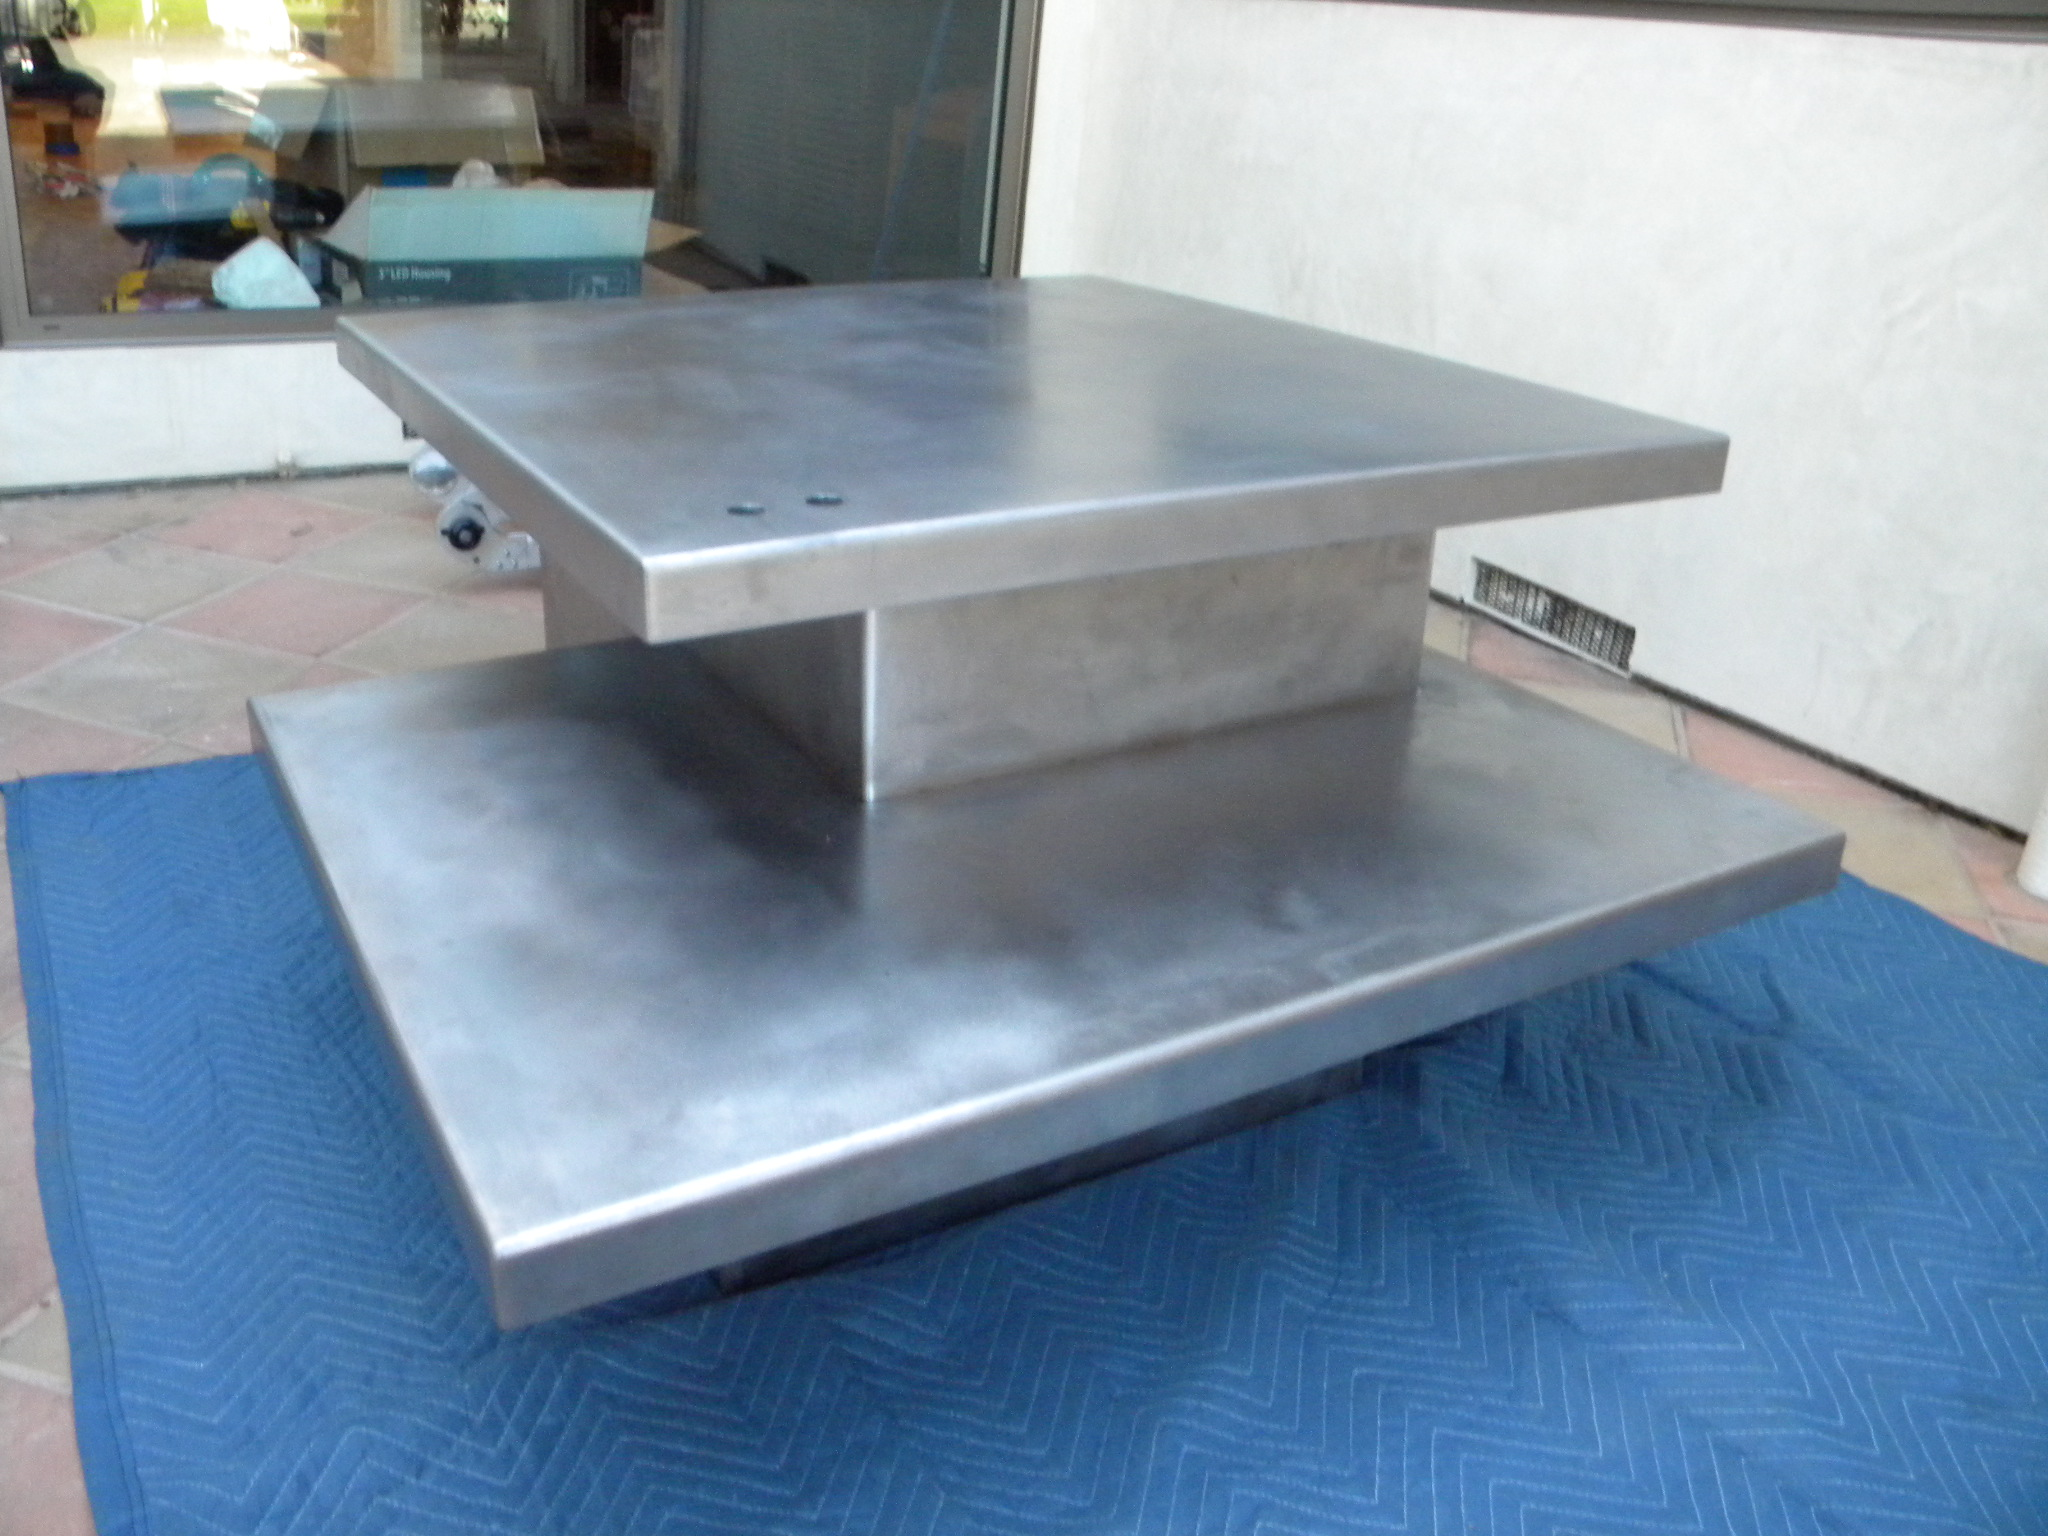 Ladderstaircase-steel-platform-DSCN7179.jpg